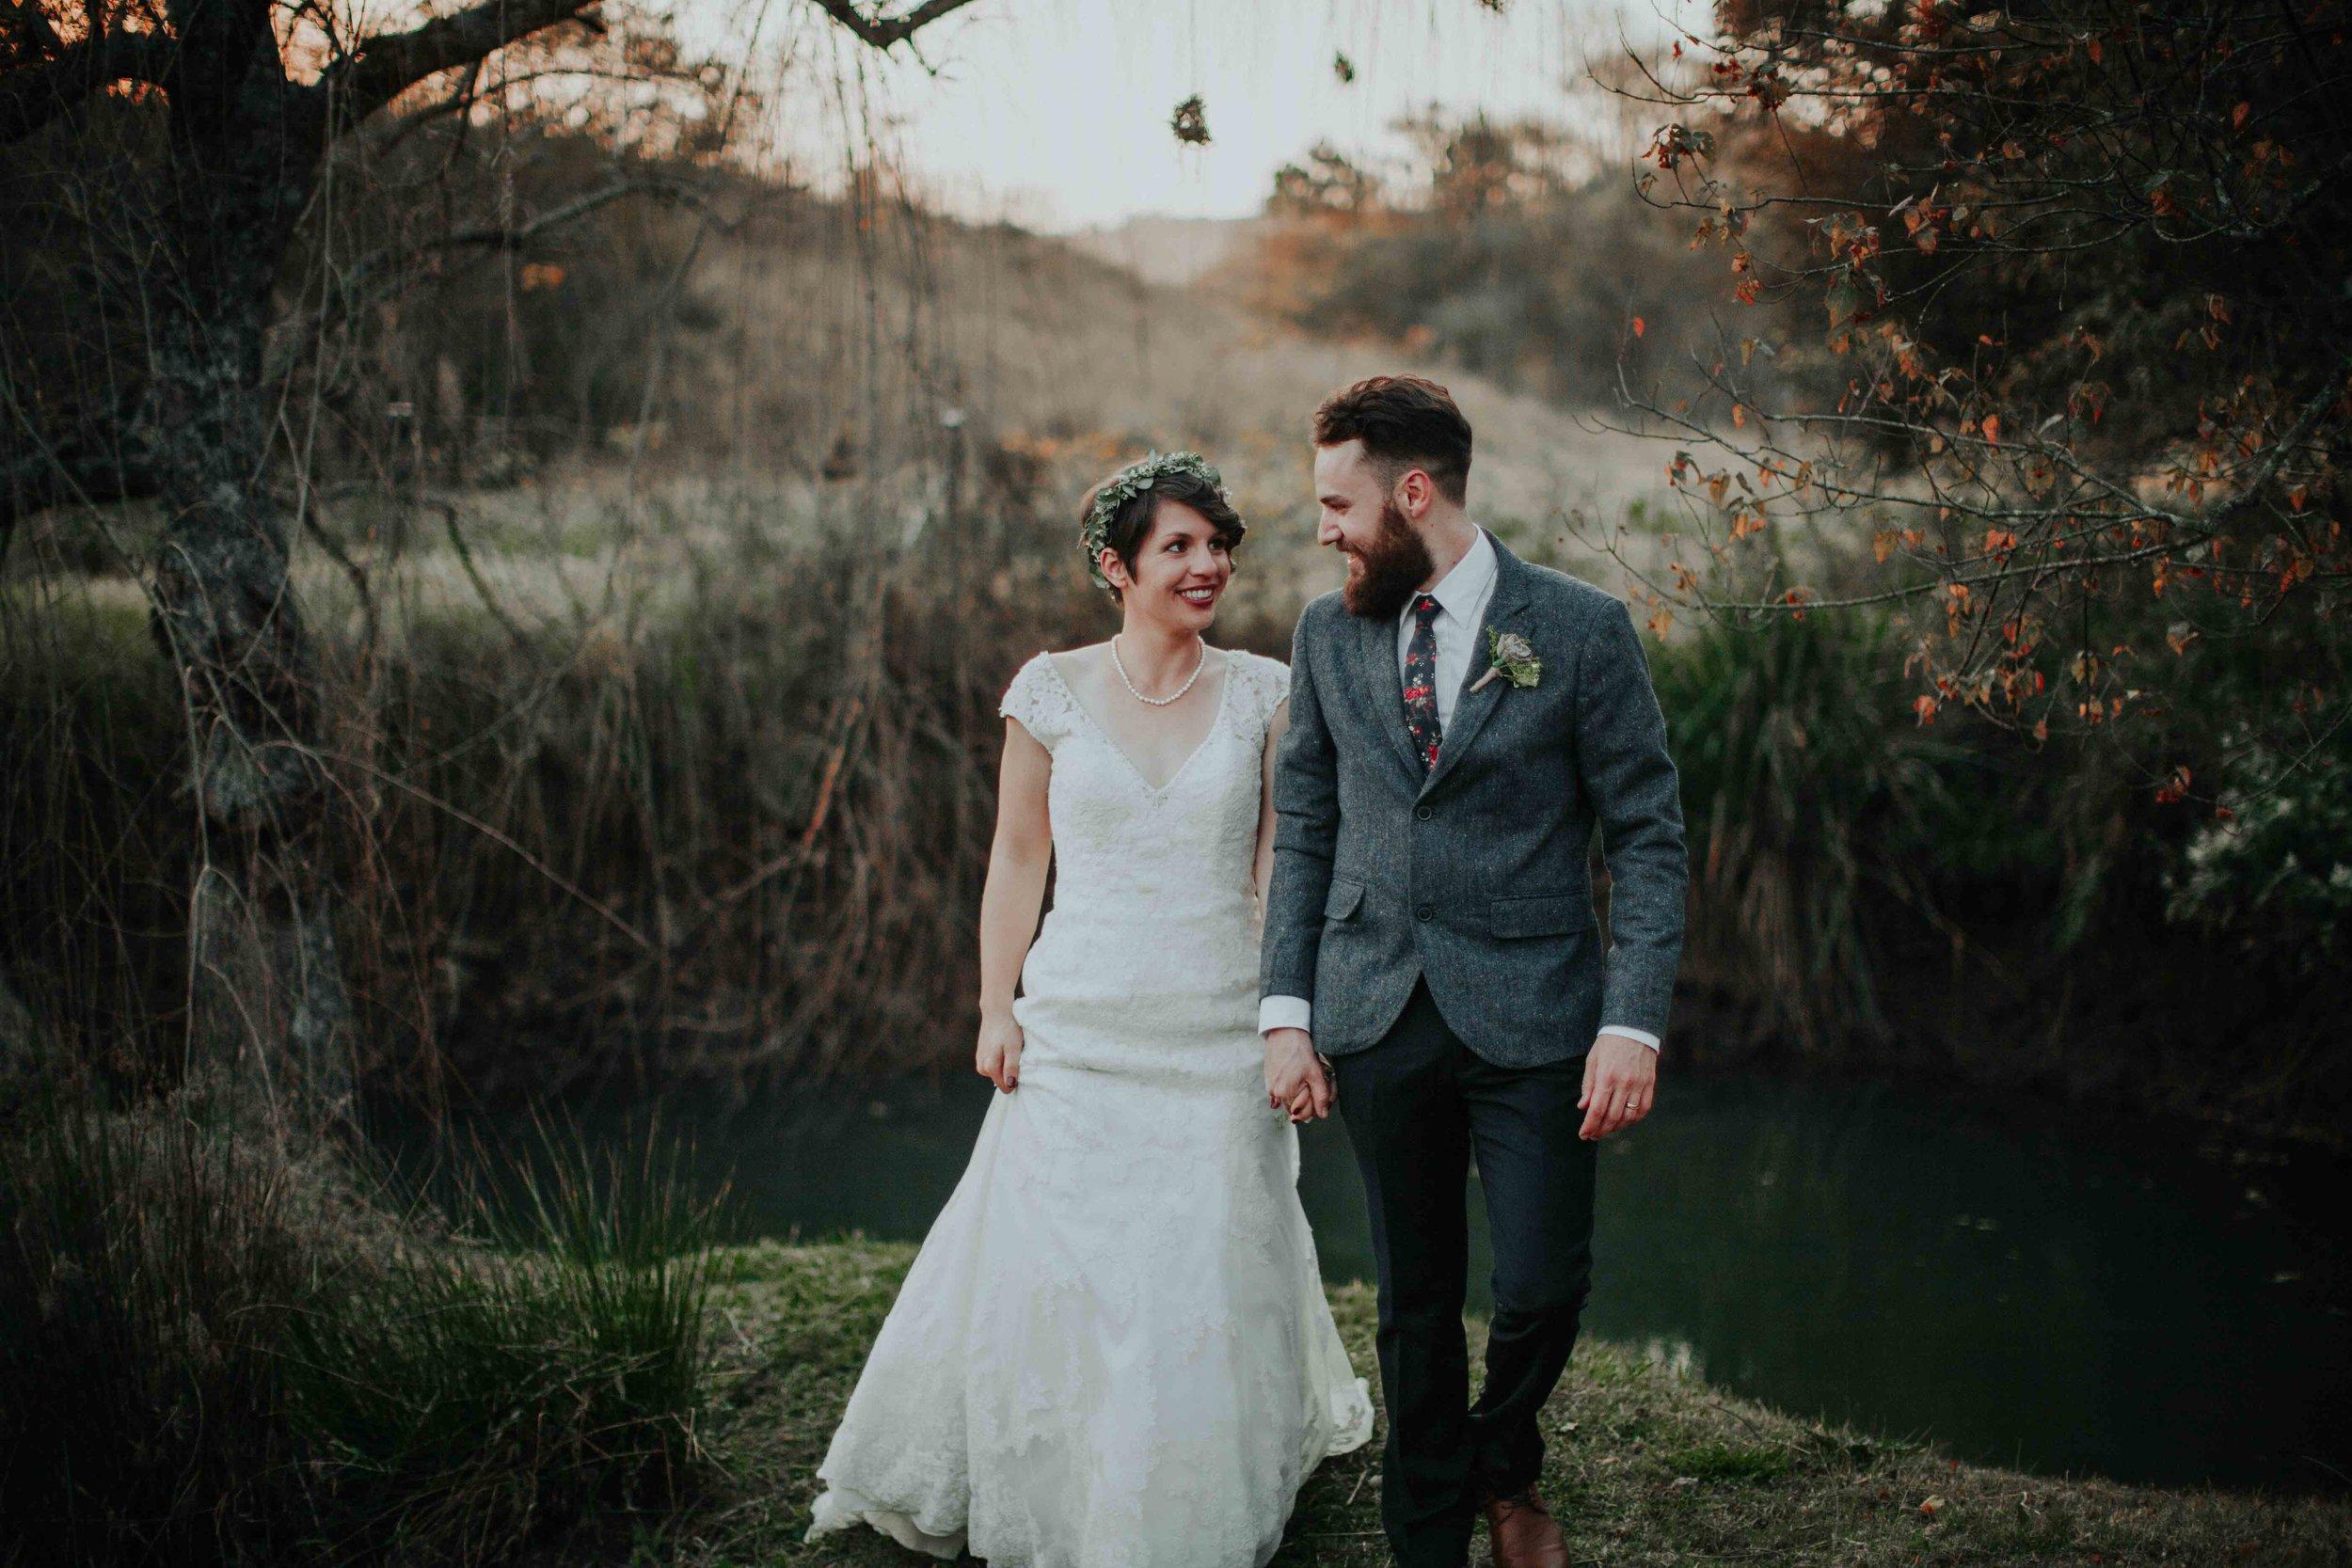 Kristi Smith Photography_Eloff&Jeanette_ Wedding Photographer 29.jpg